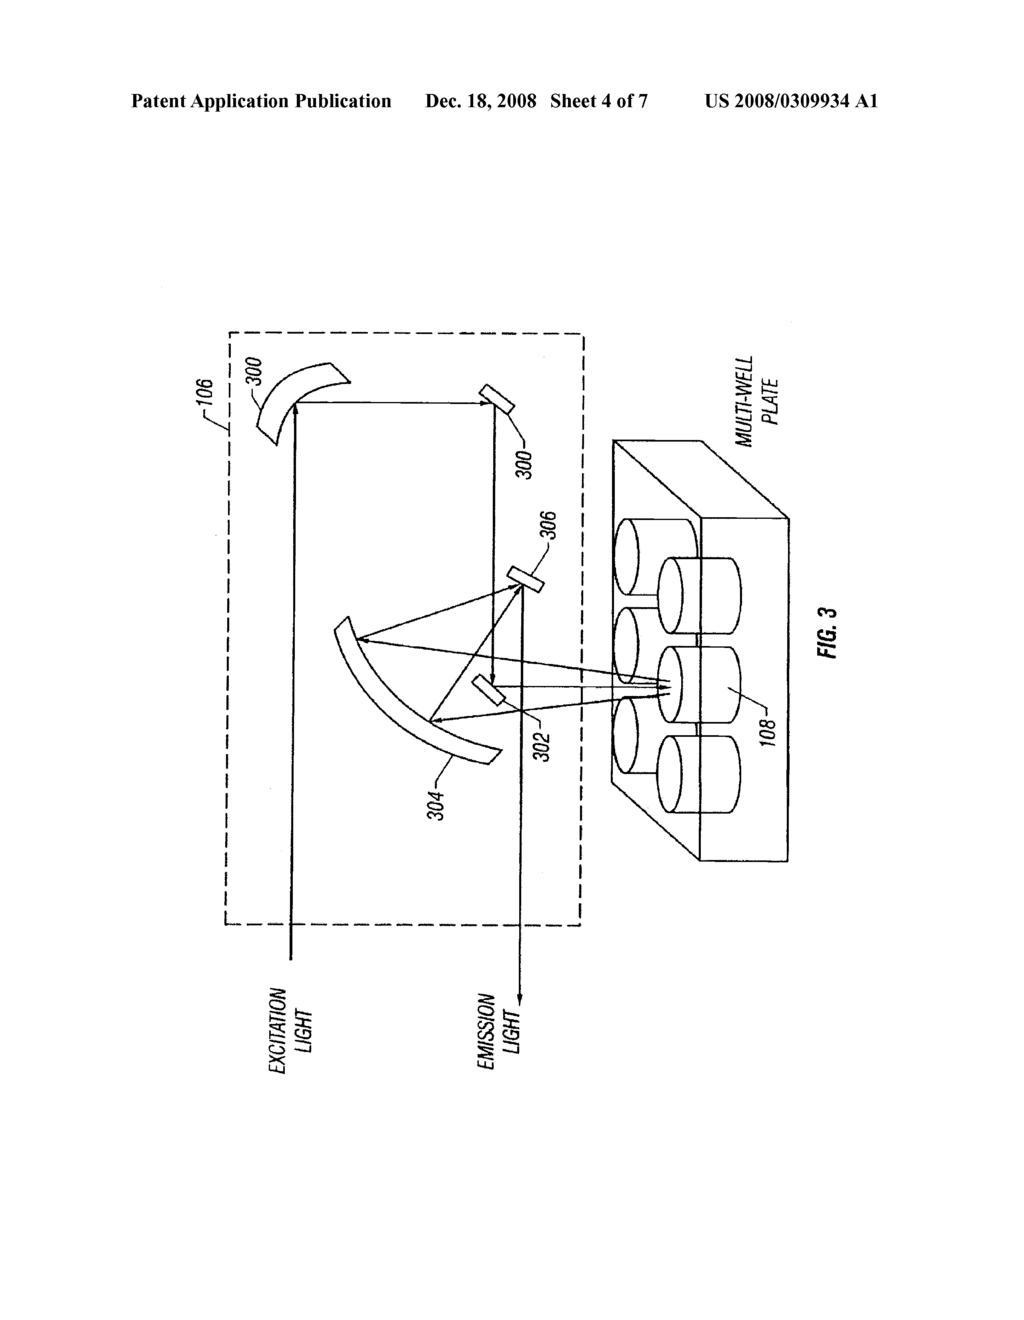 Scanning Spectrophotometer For High Throughput Fluorescence